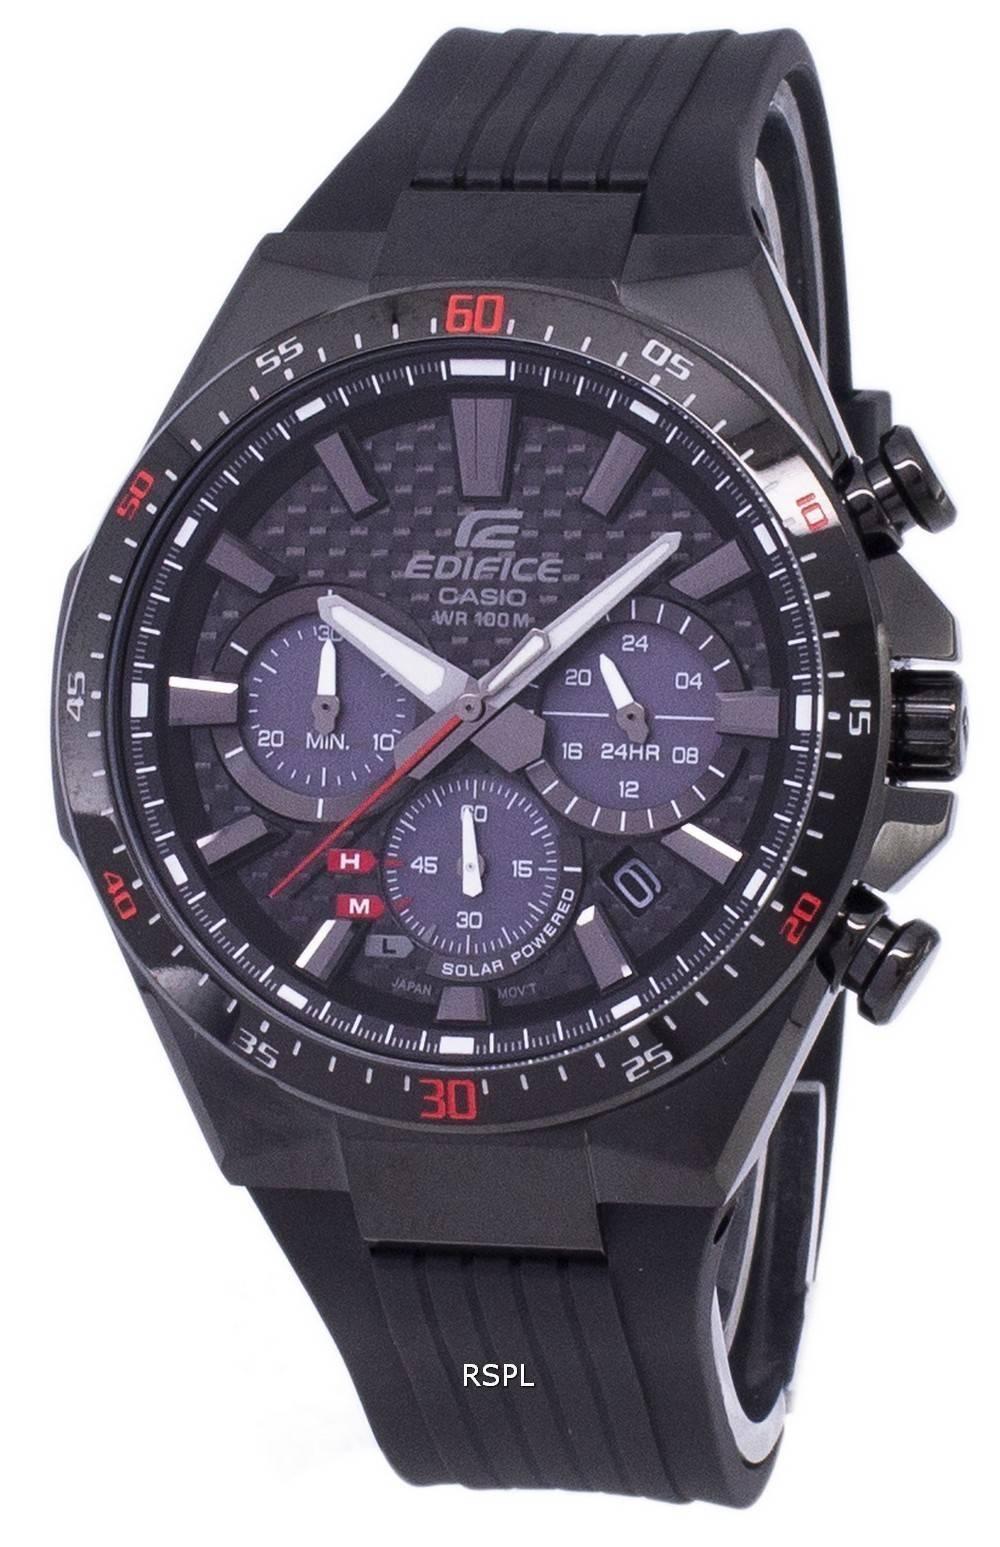 609eca6ffb69f5 Montre chronographe solaire Casio Edifice EQS-800CPB-1AV EQS800CPB-1AV  masculine